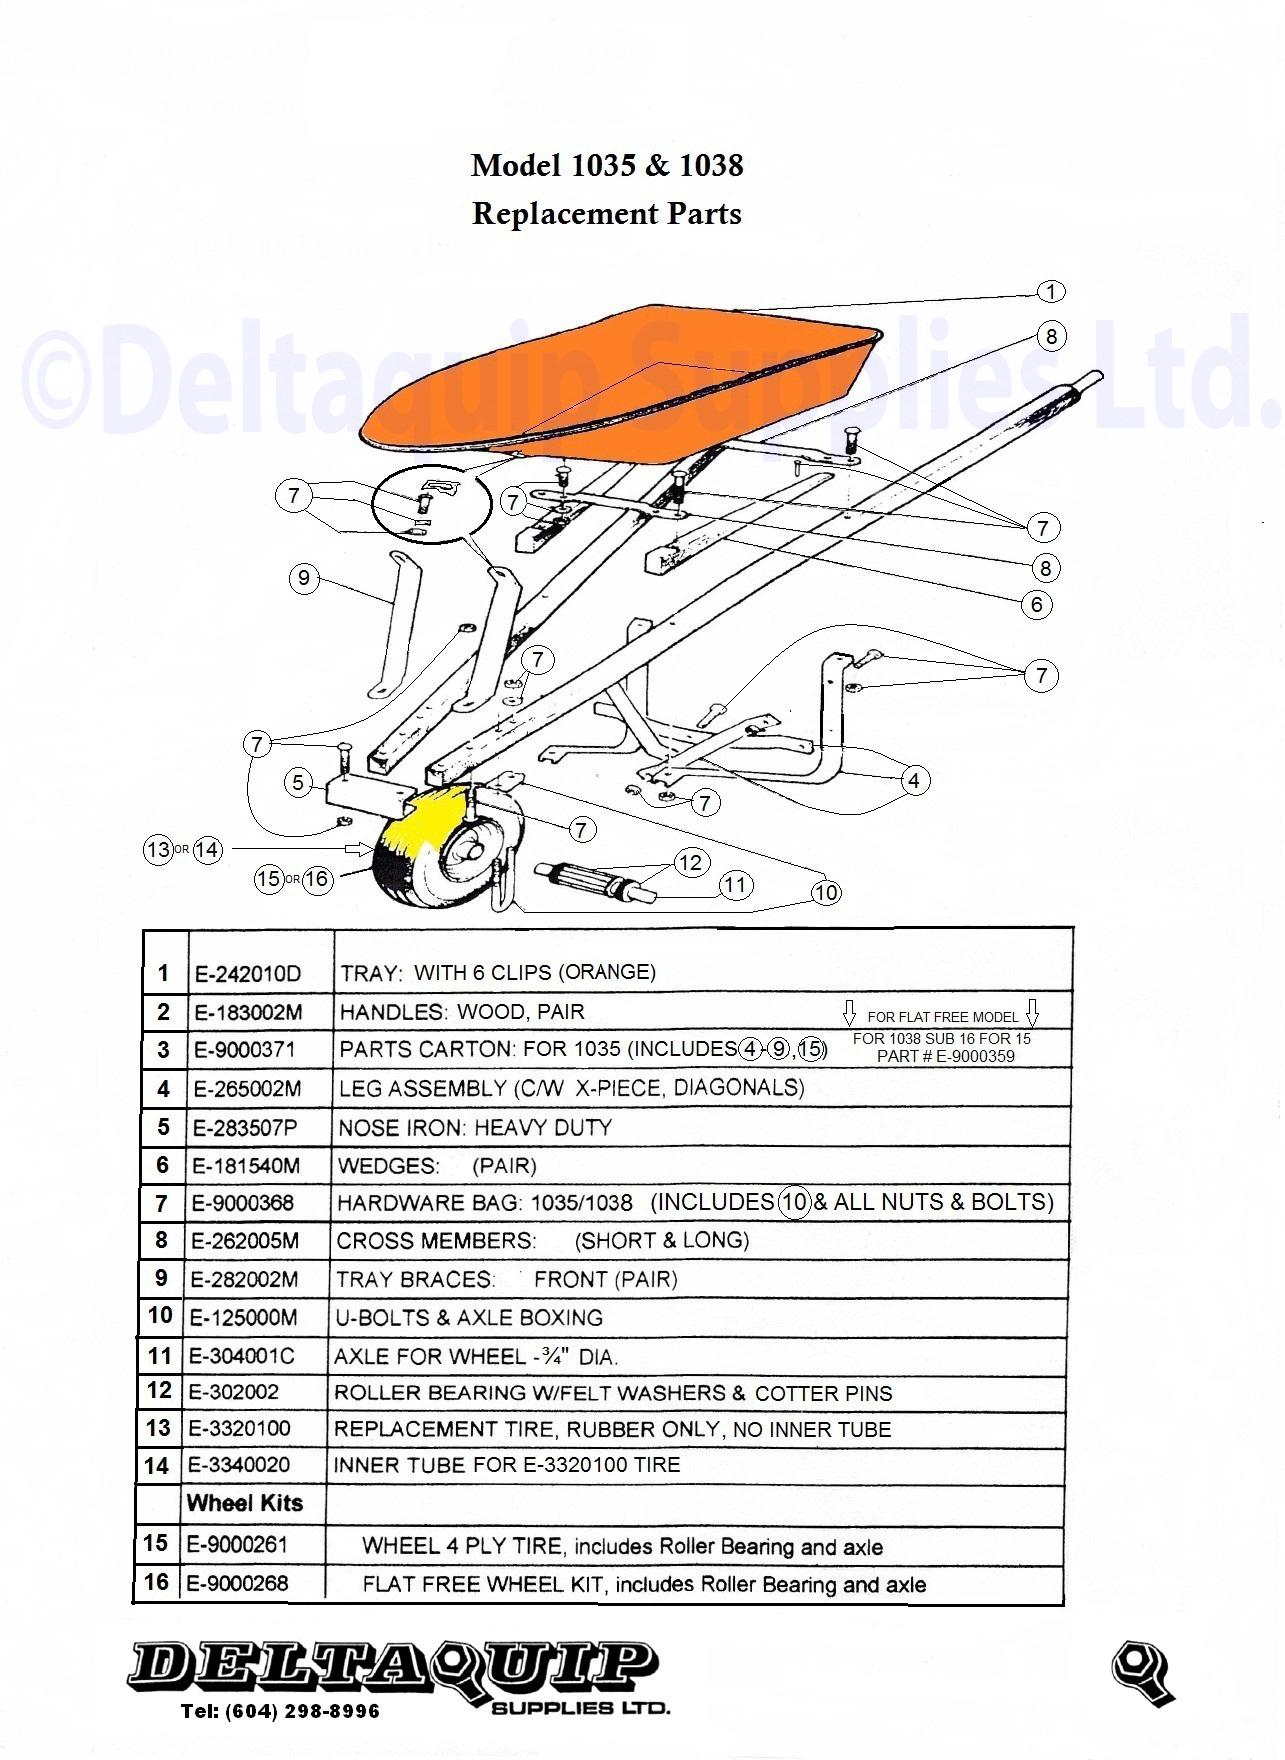 1038 Wheelbarrow Deltaquip Supplies Ltd